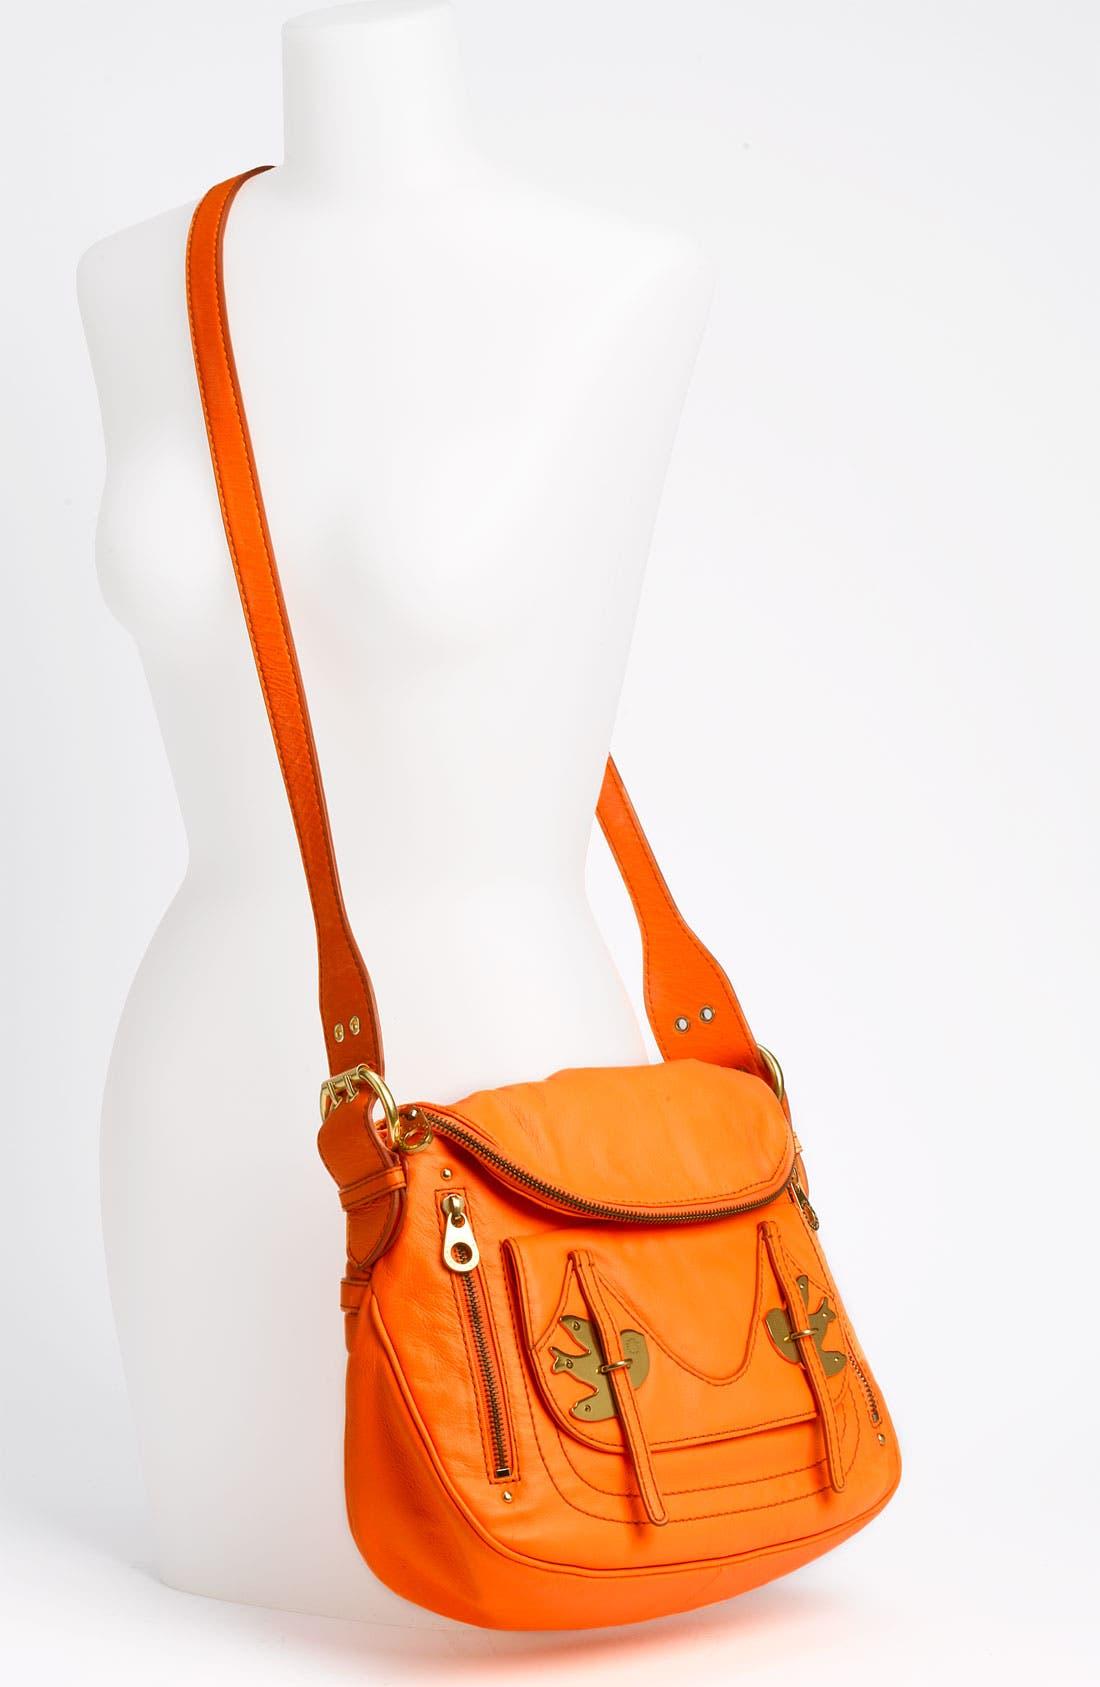 ,                             MARC BY MARC JACOBS 'Petal to the Metal - Natasha' Flap Crossbody Bag, Medium,                             Alternate thumbnail 47, color,                             823